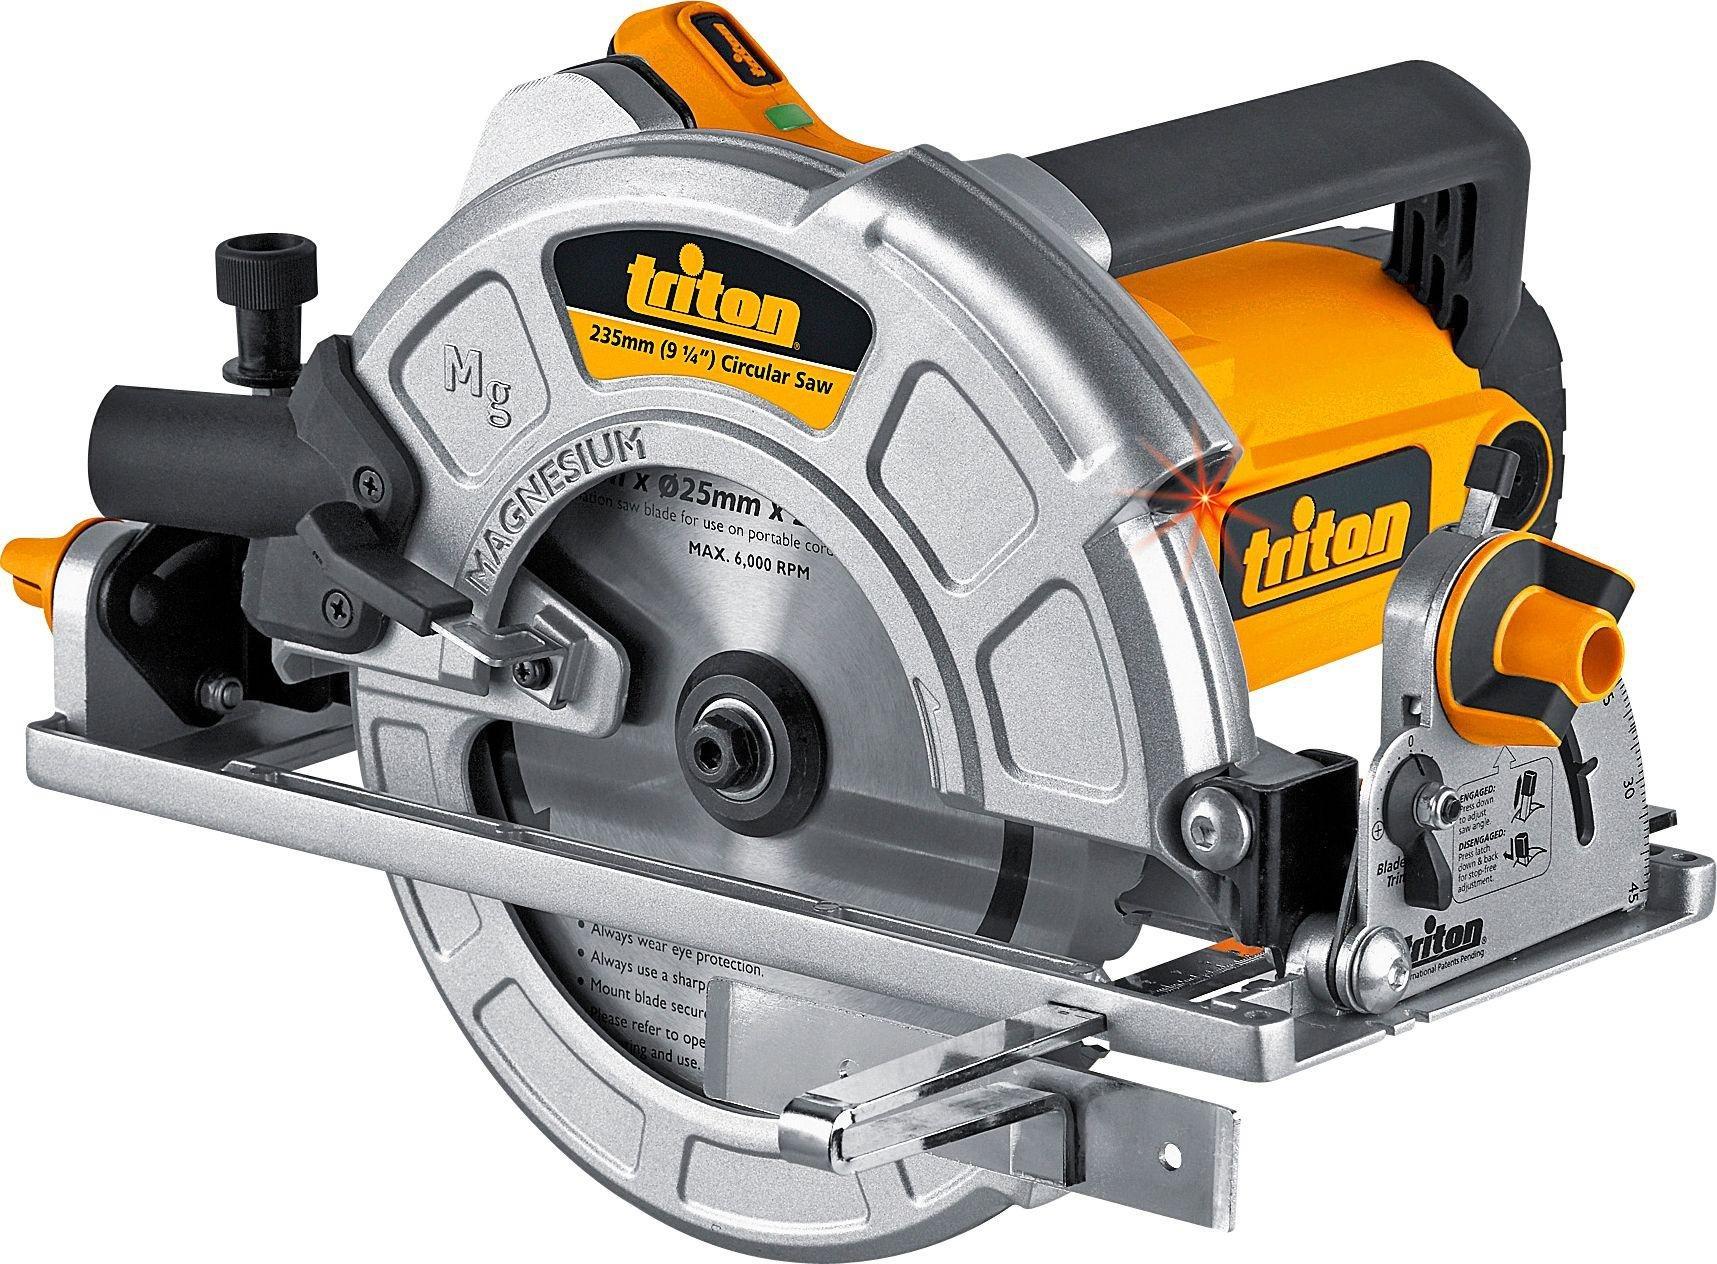 Triton TA235CSL Precision Circular Saw 2300W. lowest price